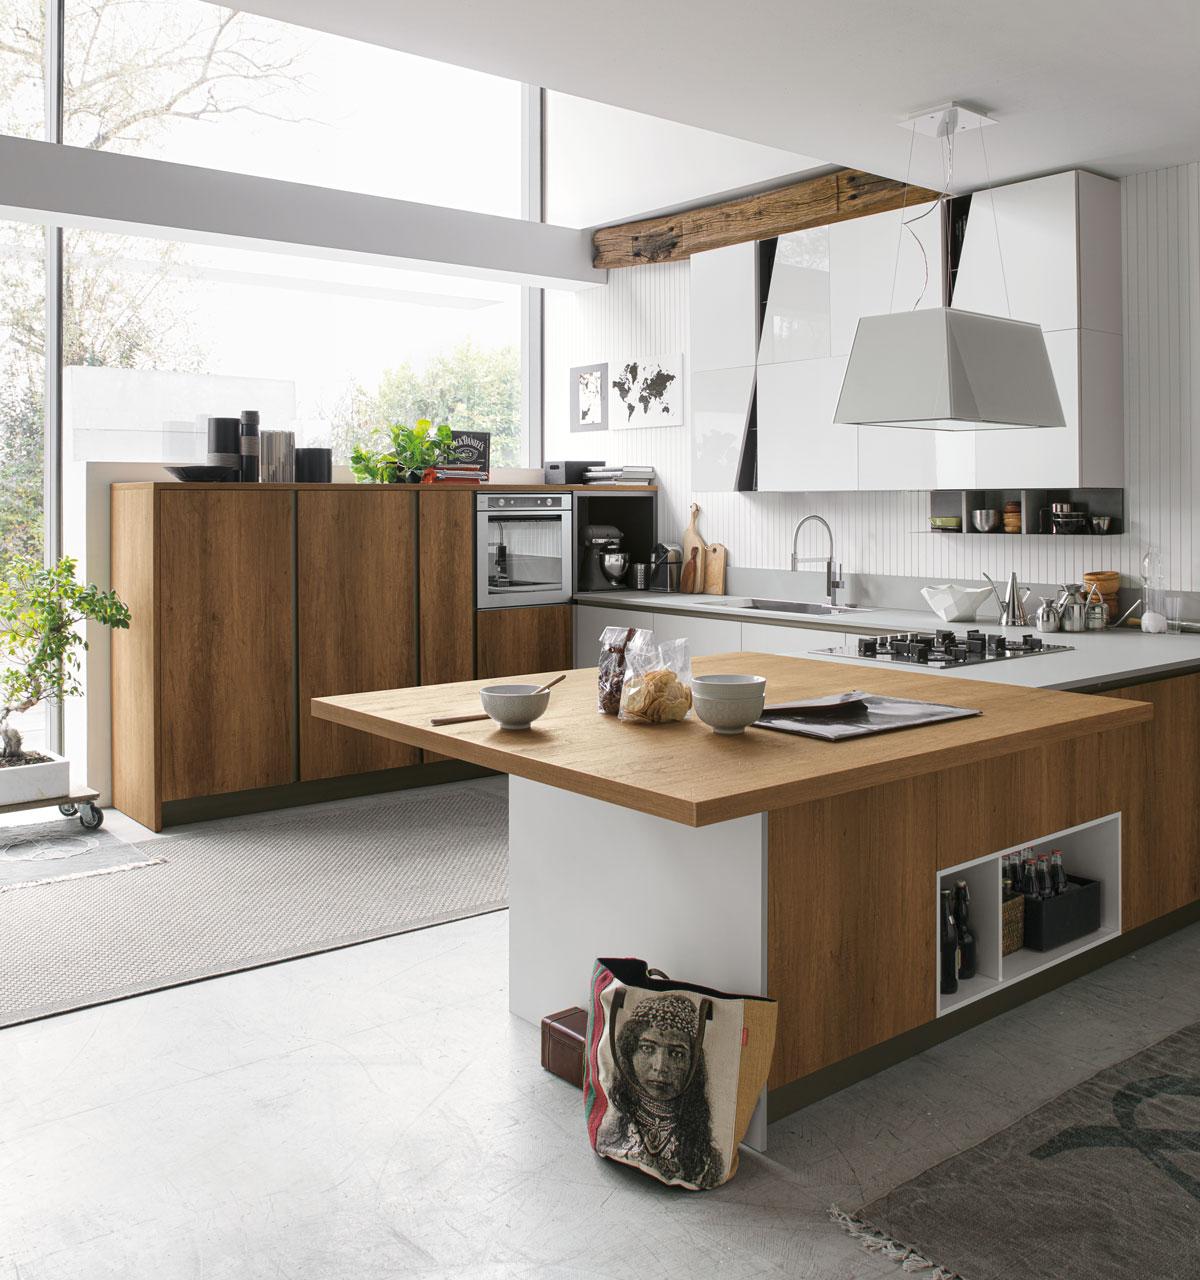 Penisola per cucina piccola for Cucine immagini